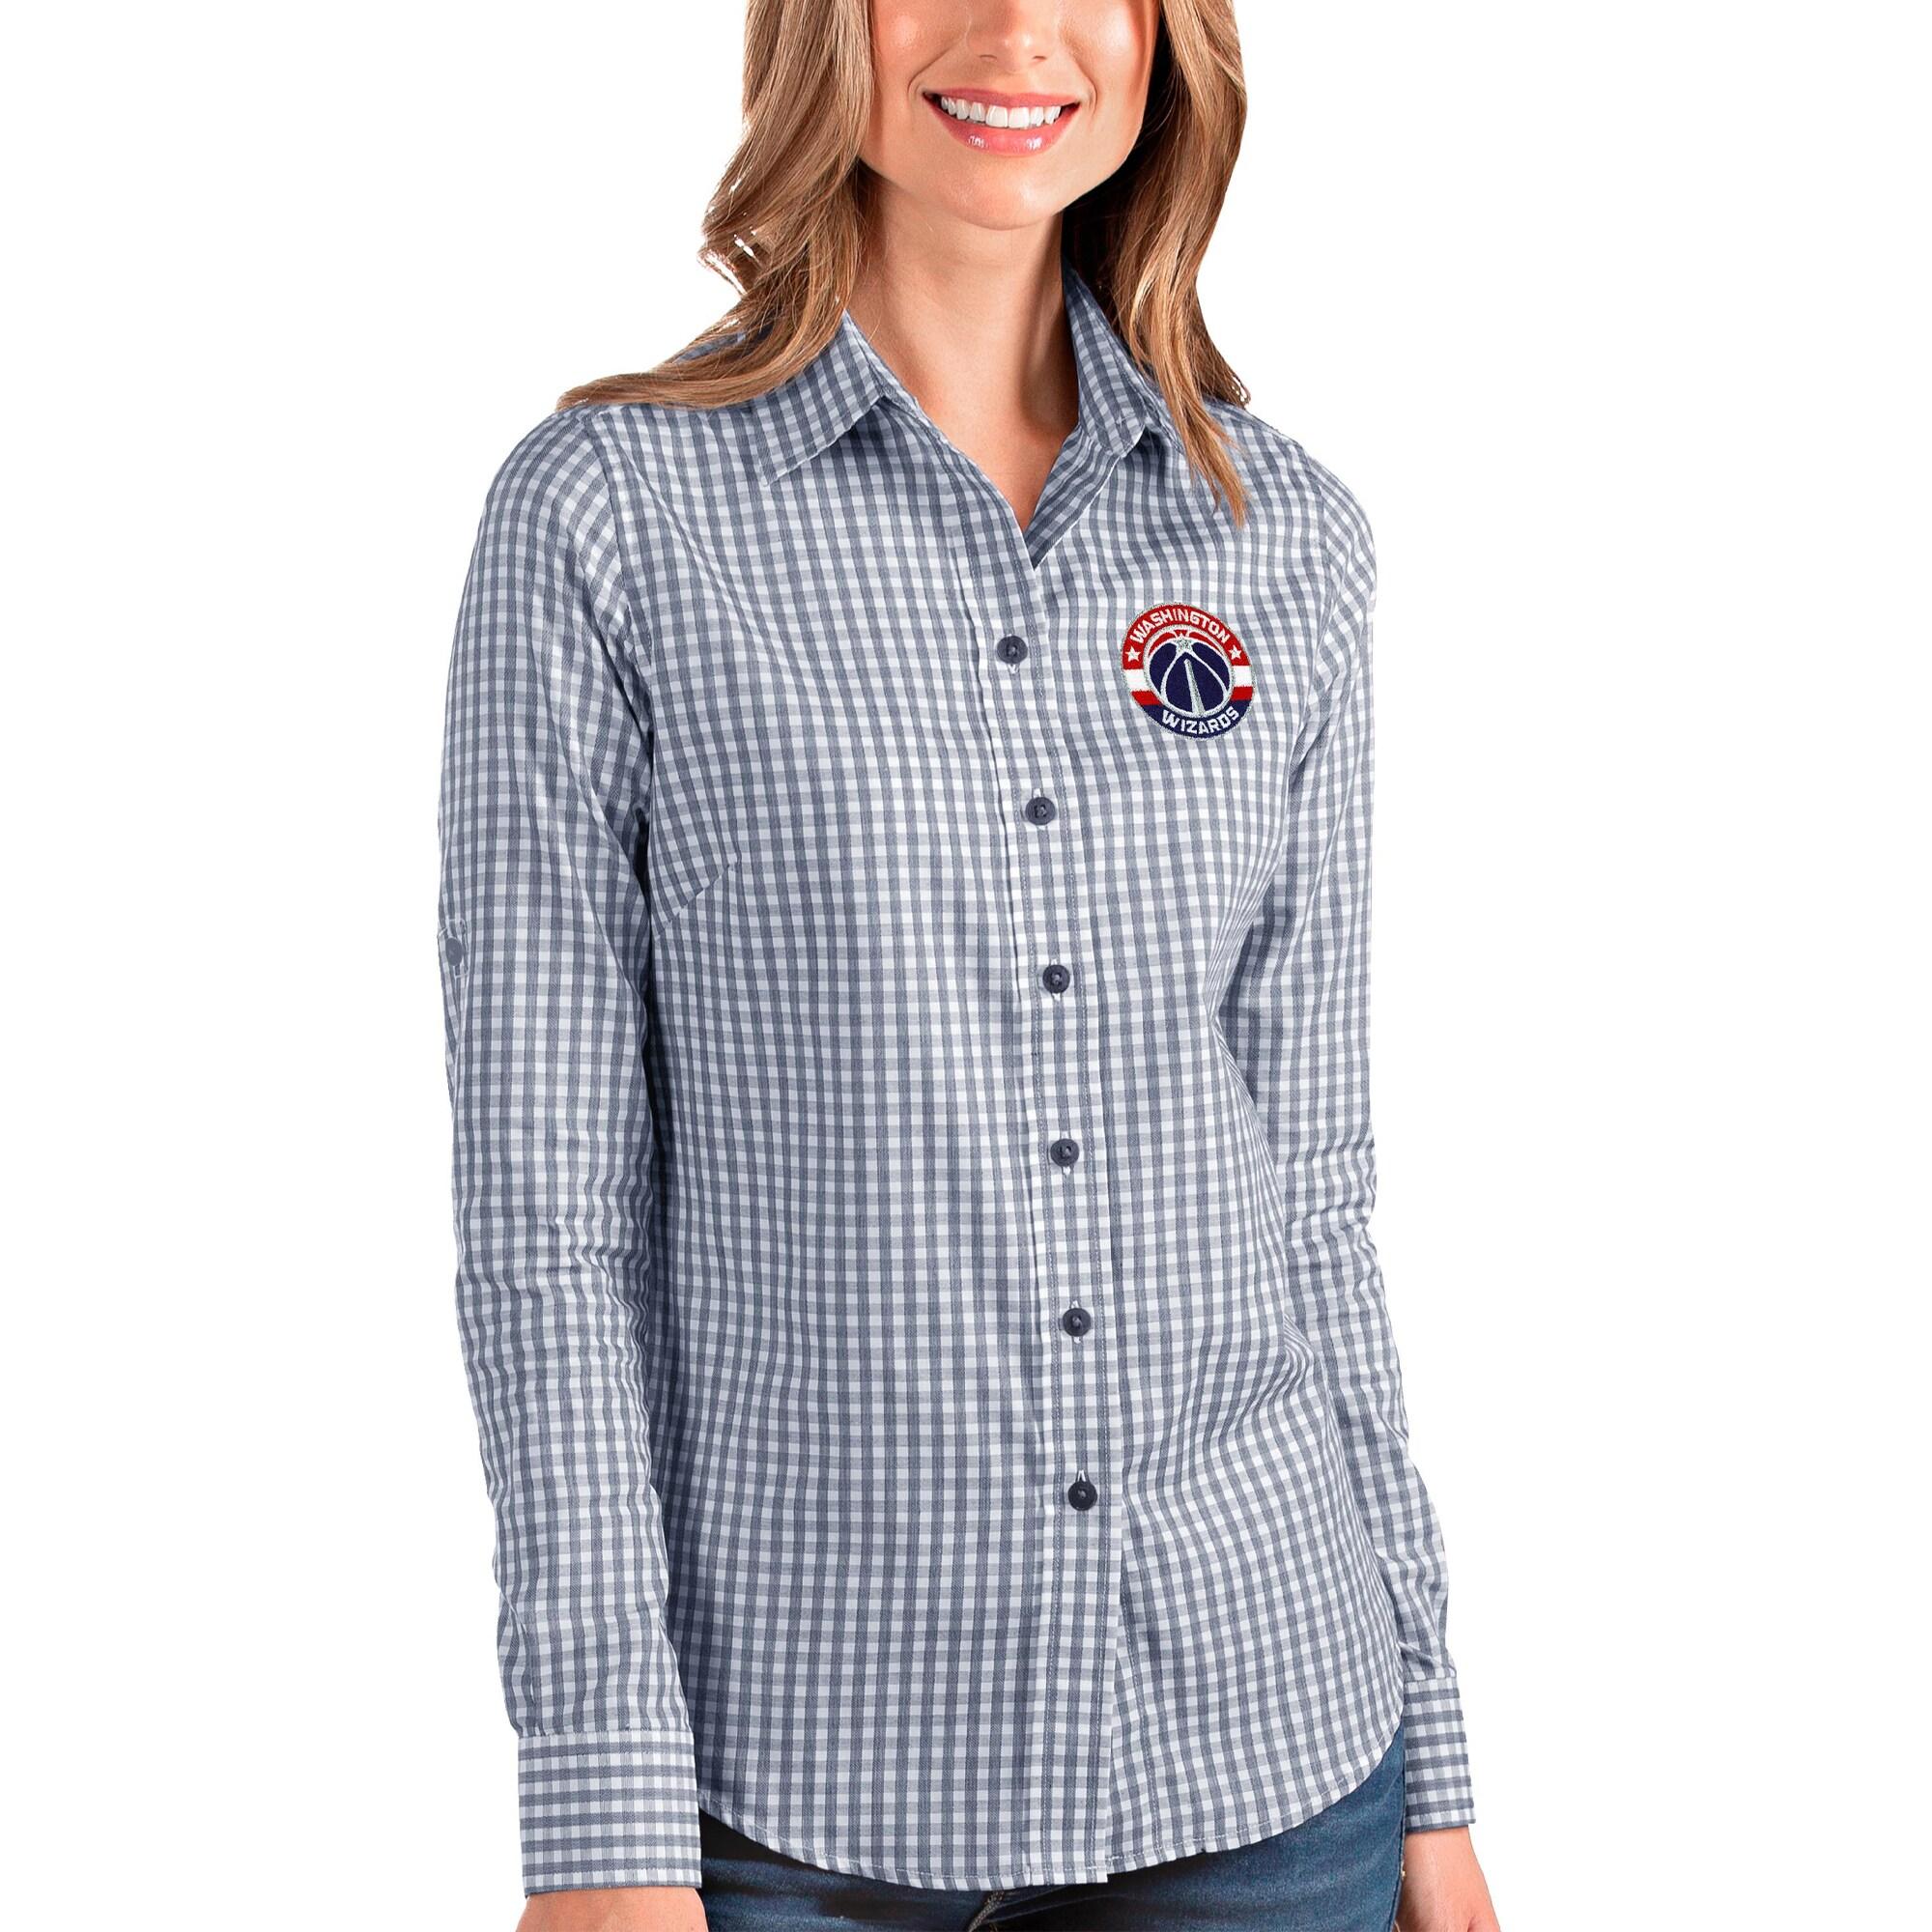 Washington Wizards Antigua Women's Structure Button-Up Long Sleeve Shirt - Navy/White